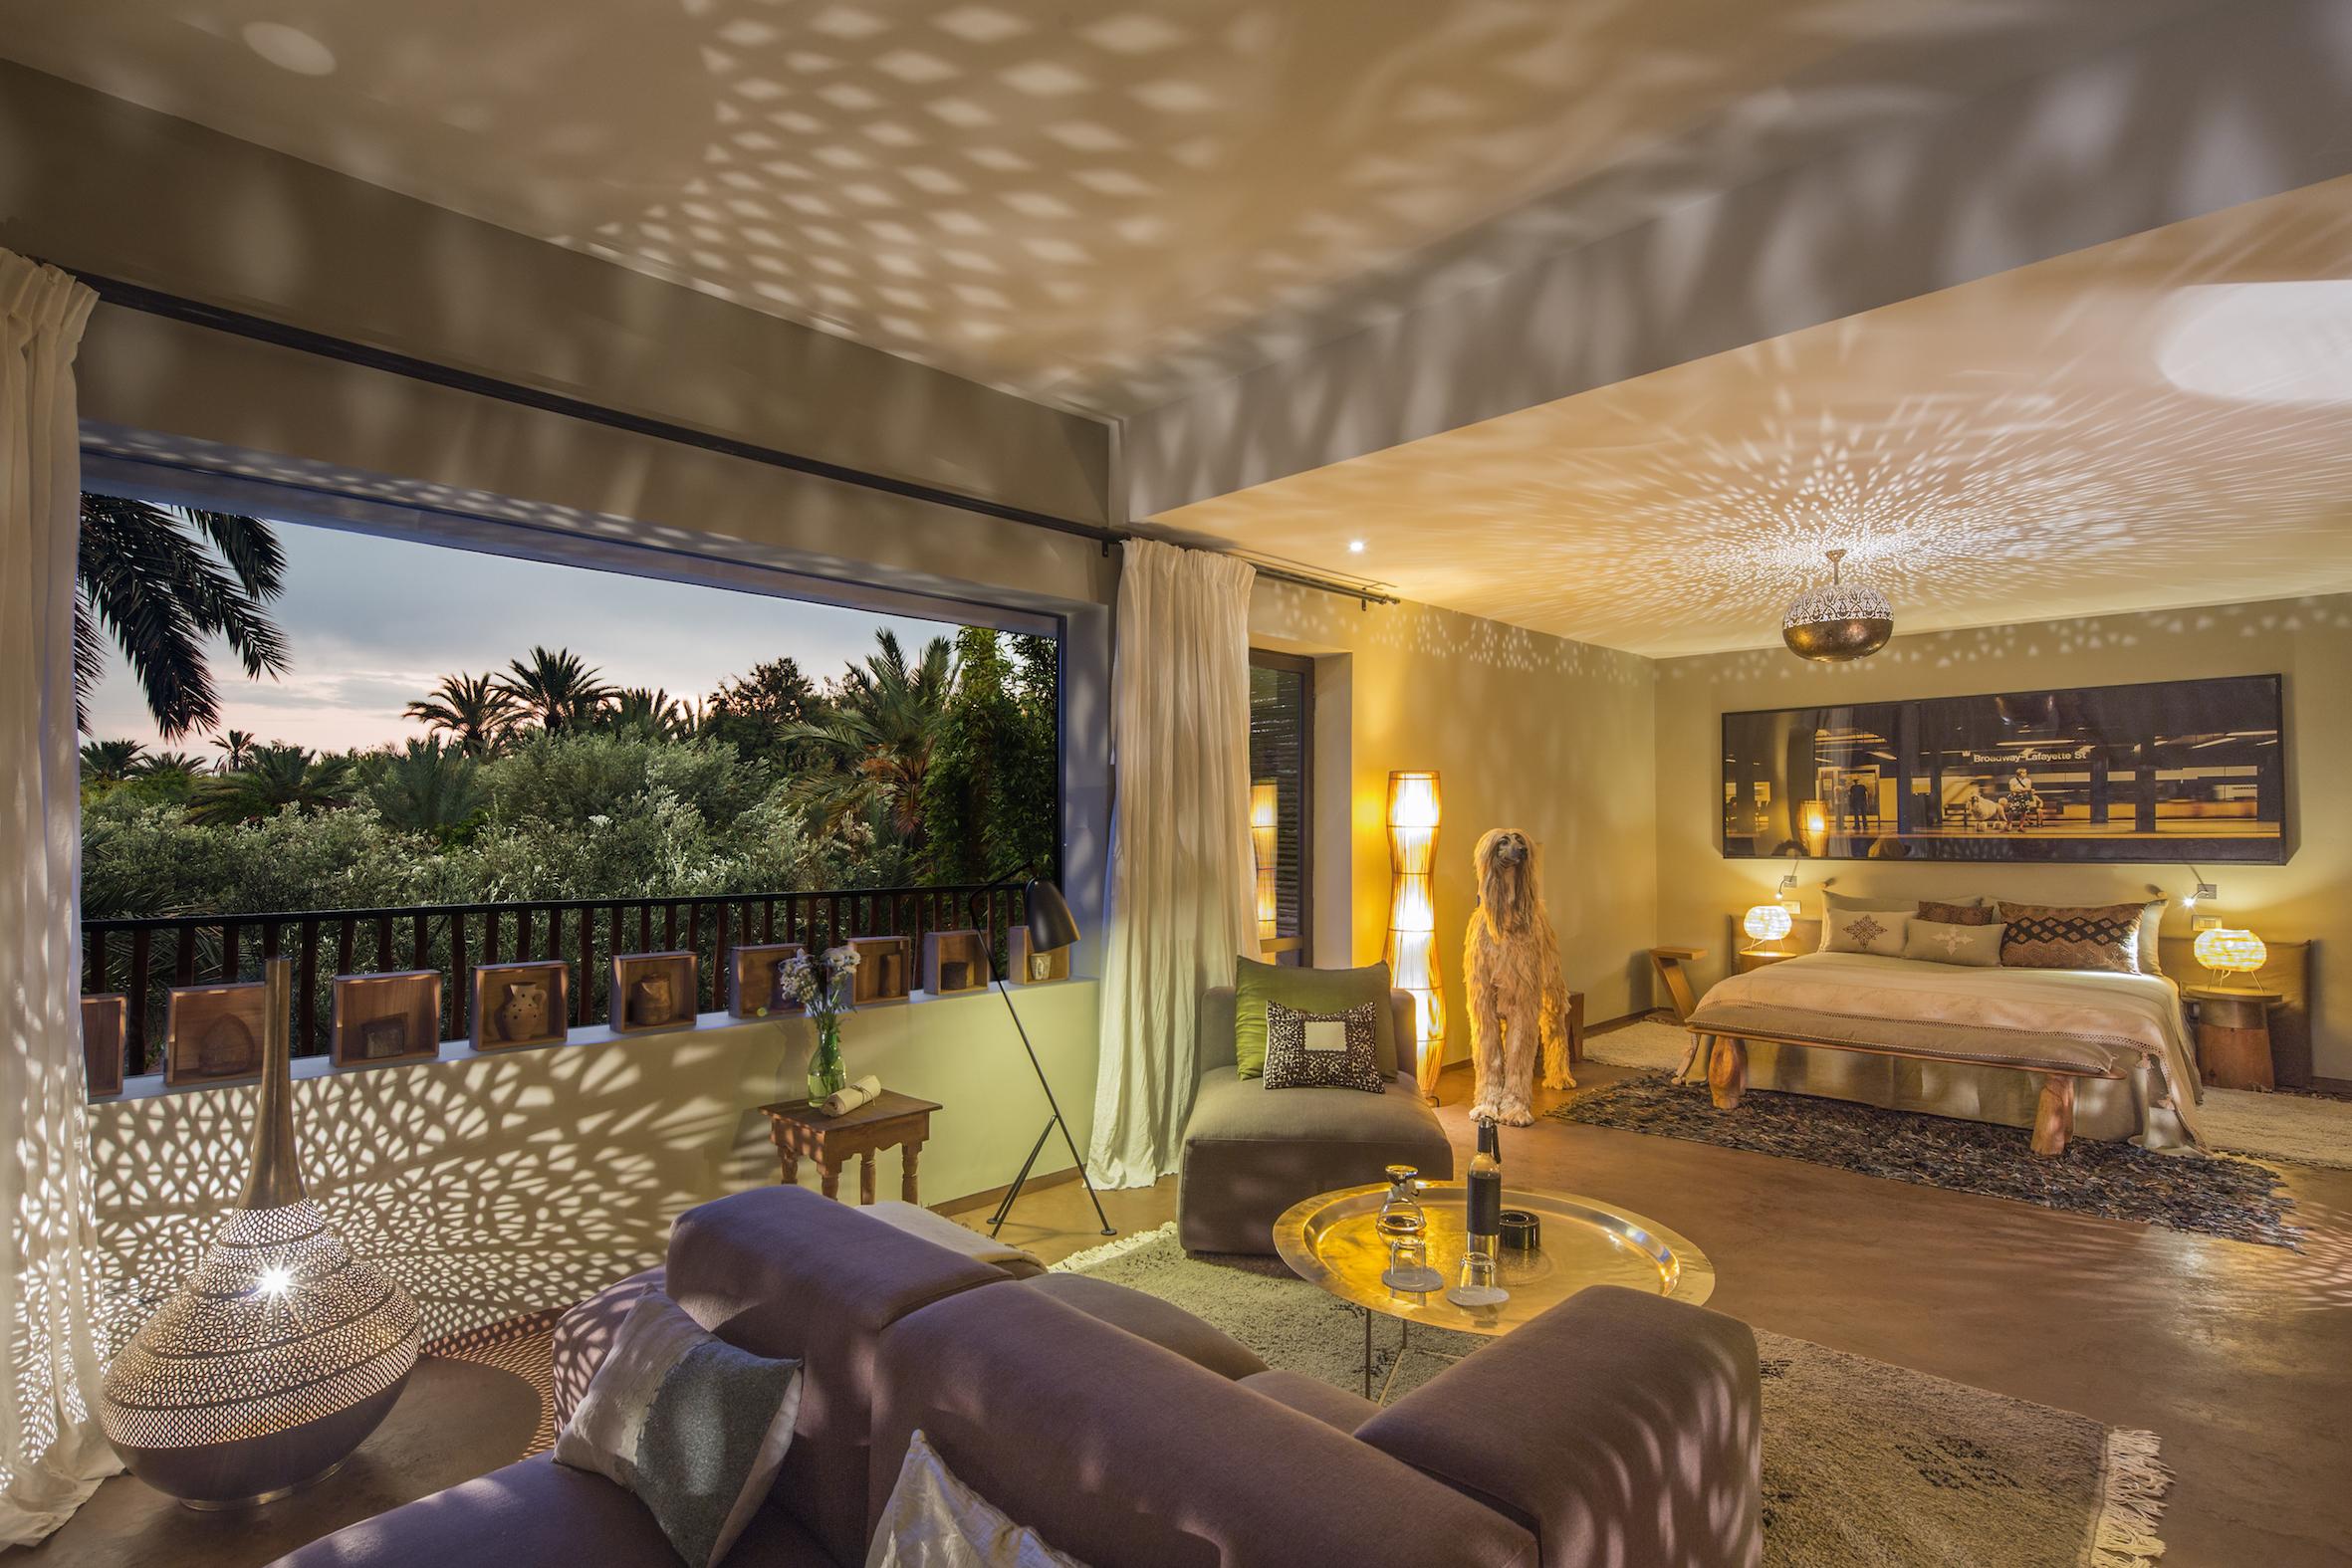 Interior Design in Marrakech